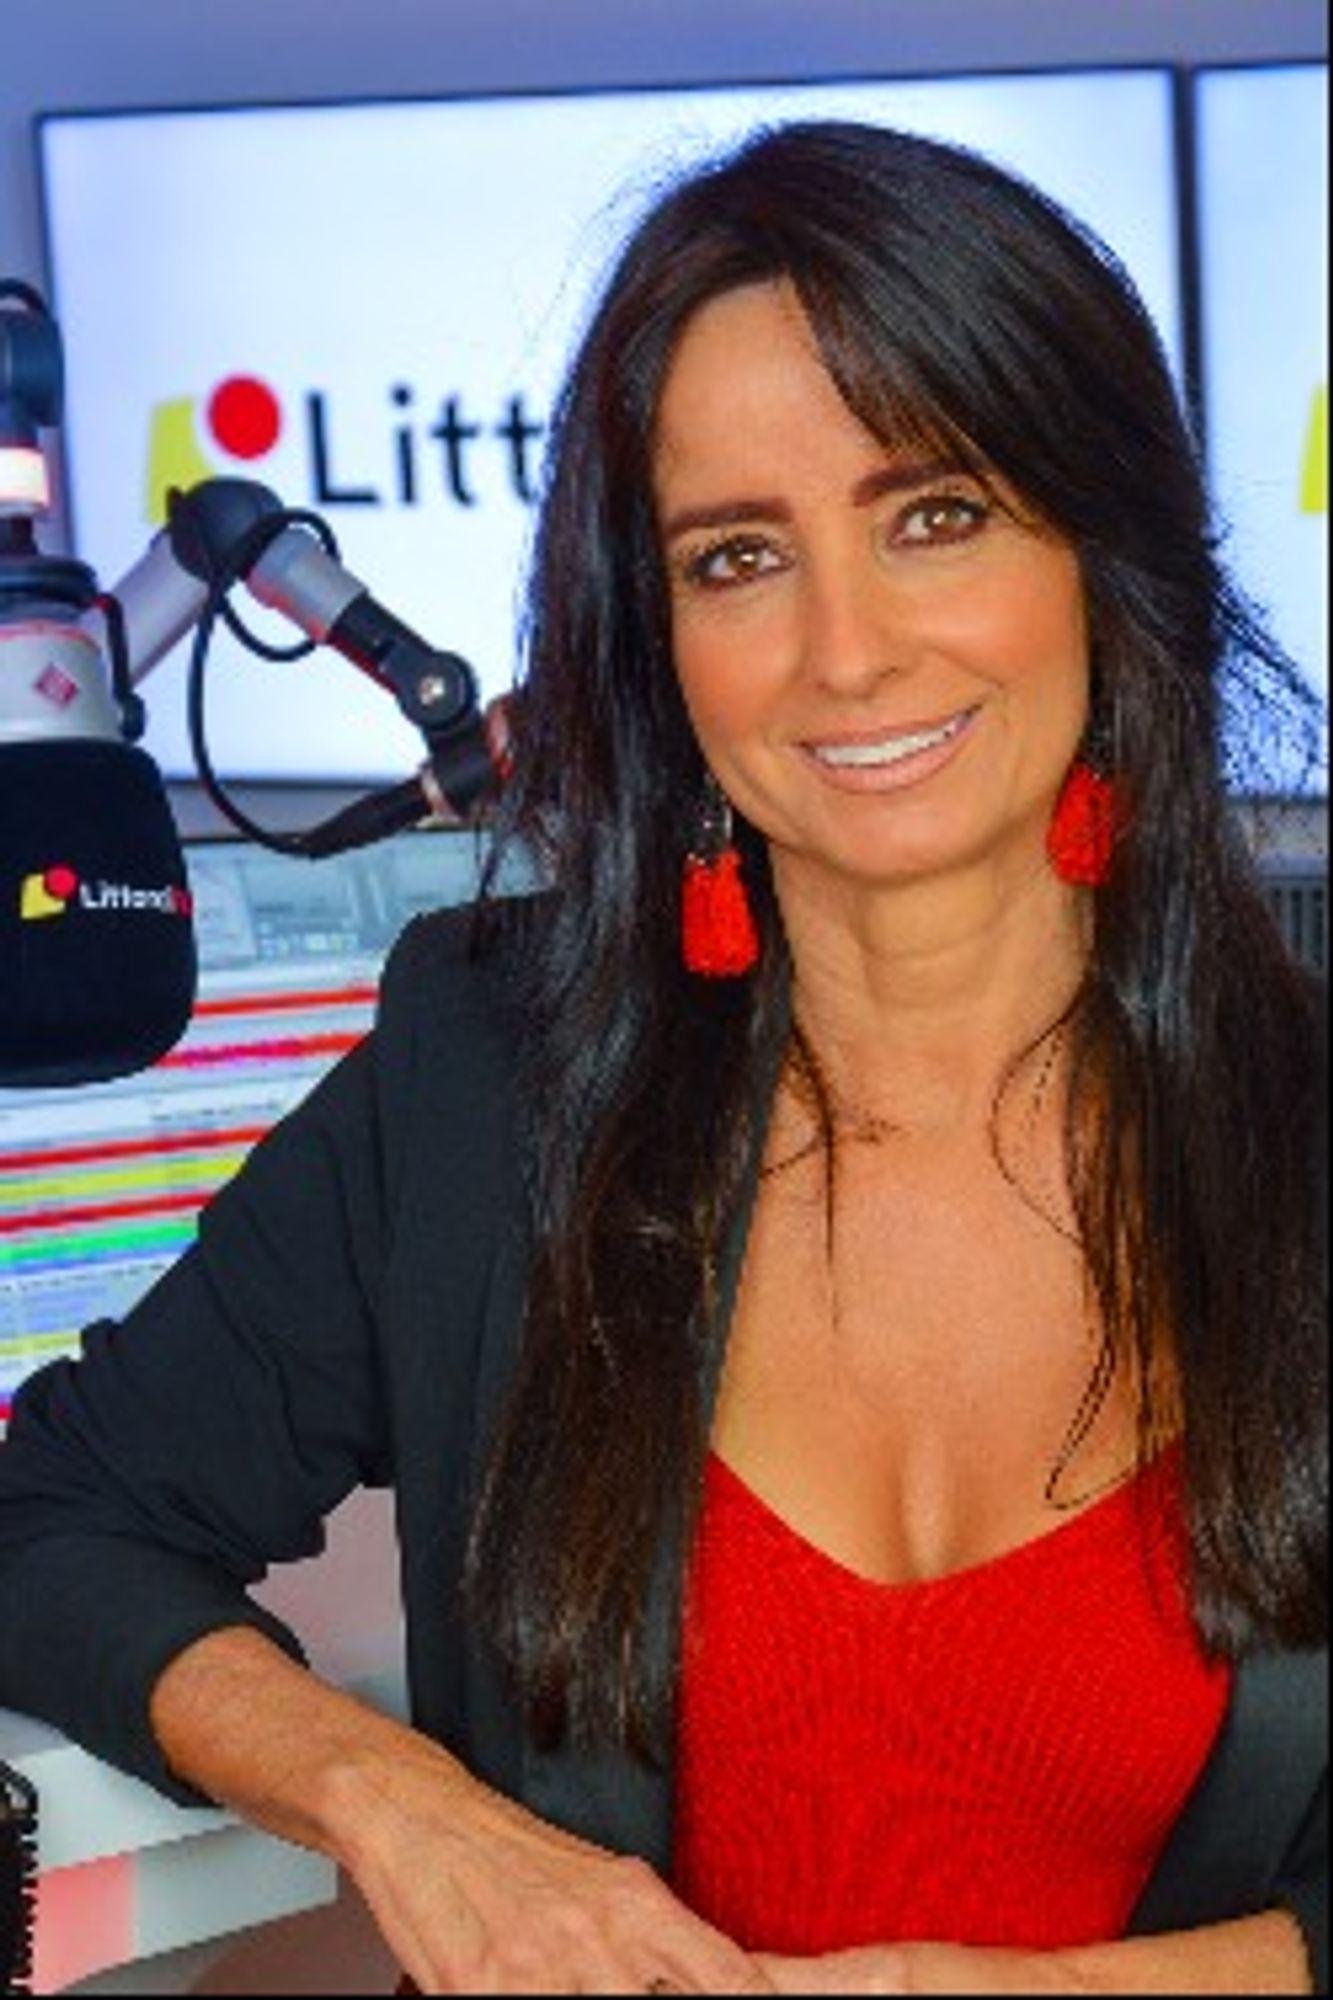 Brigitte Rousselot